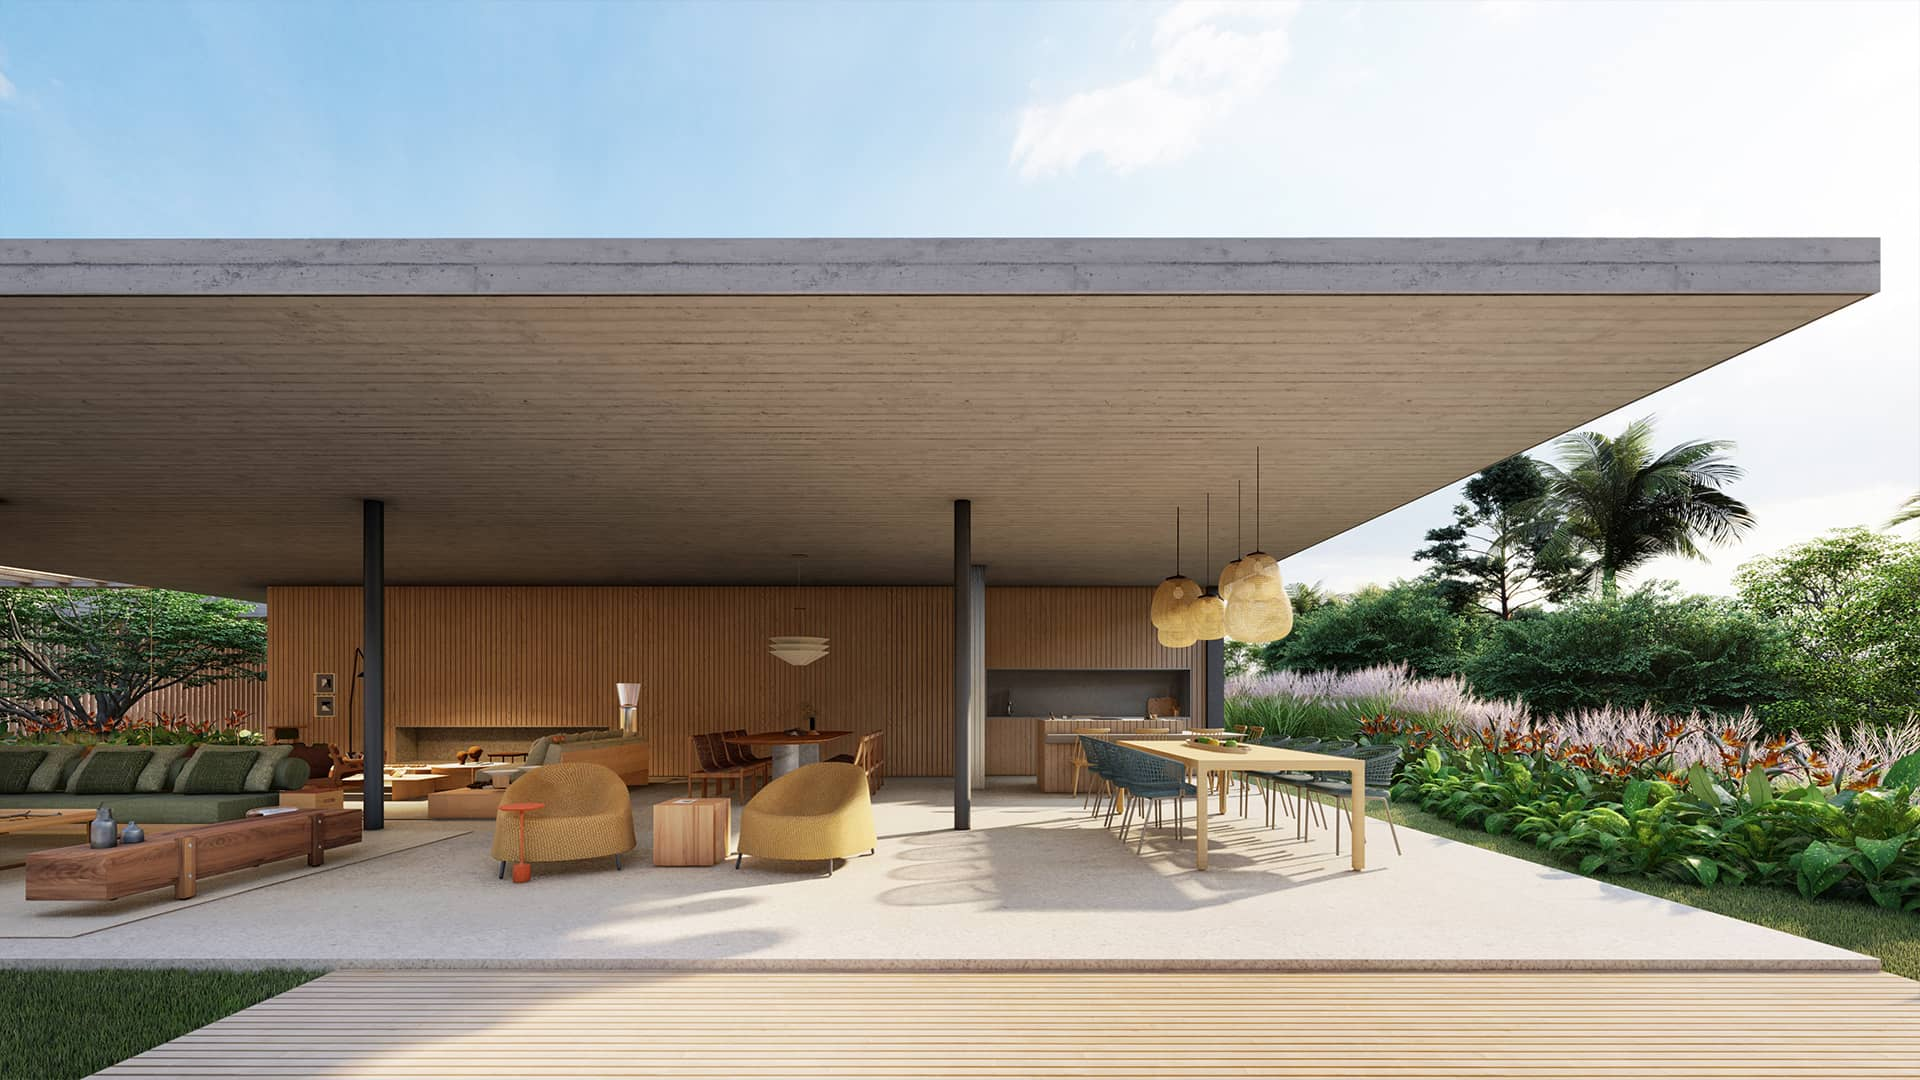 Sabella Arquitetura - Casa Concreto vista gourmet